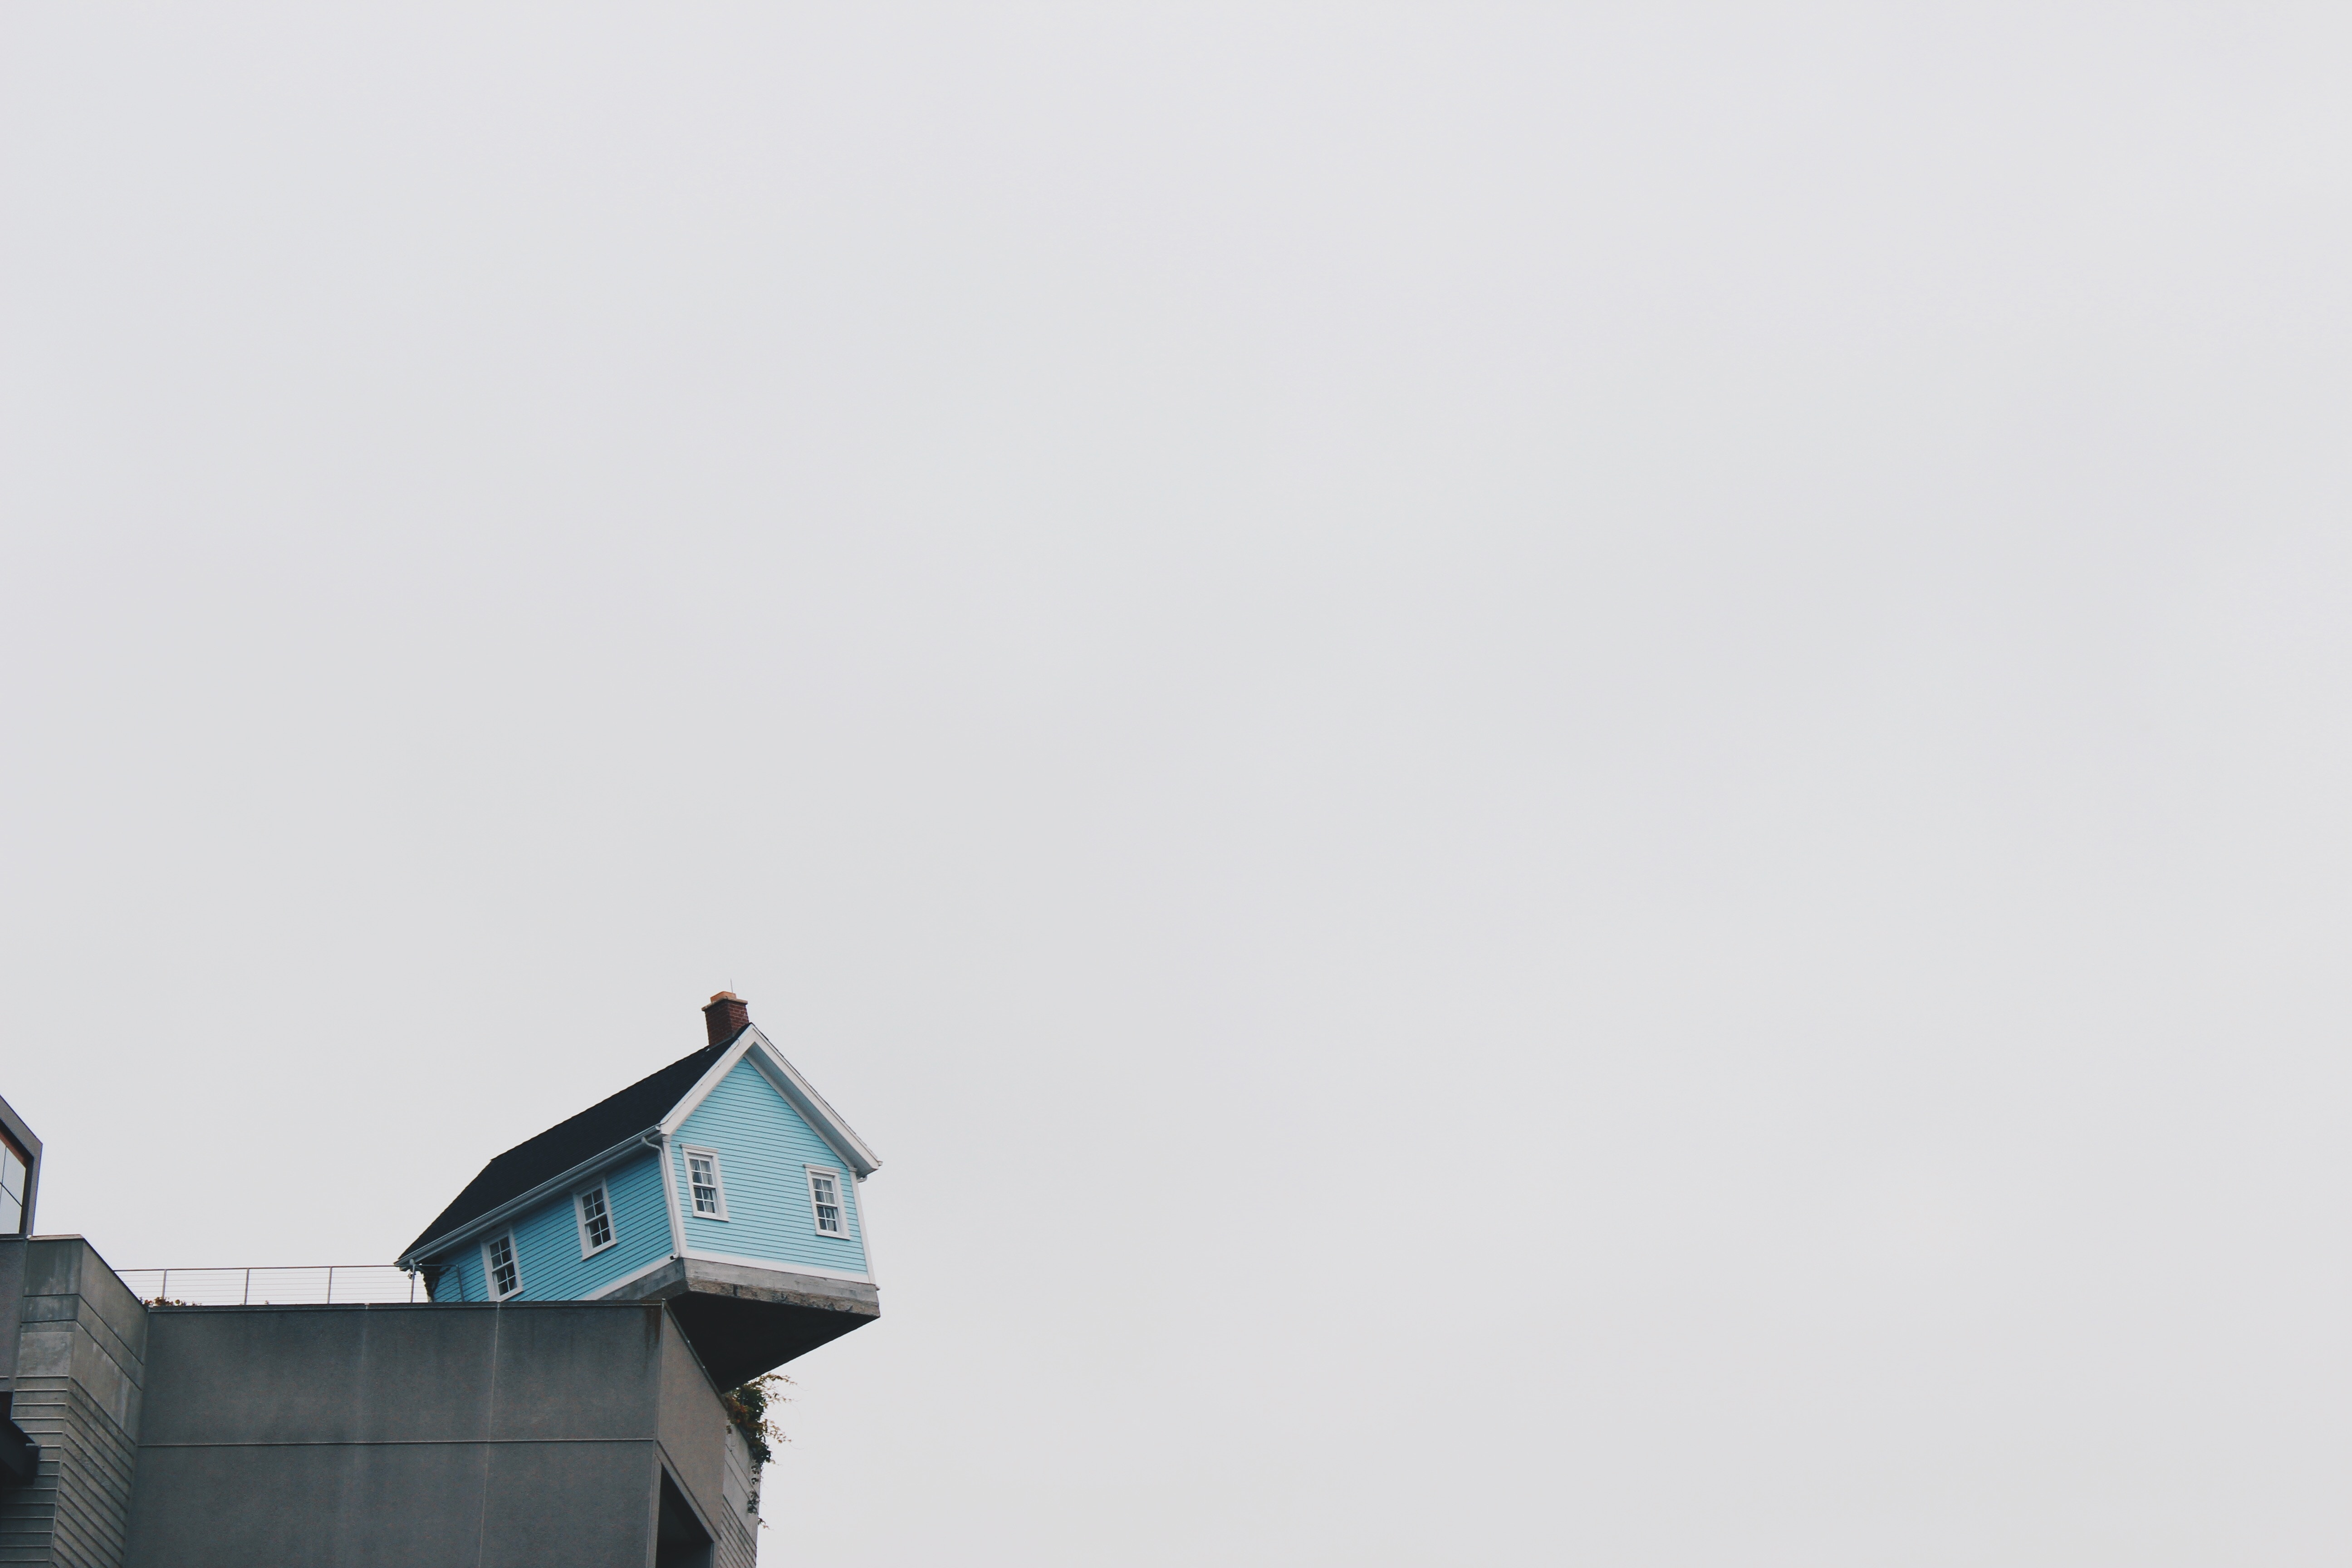 house-on-ledge